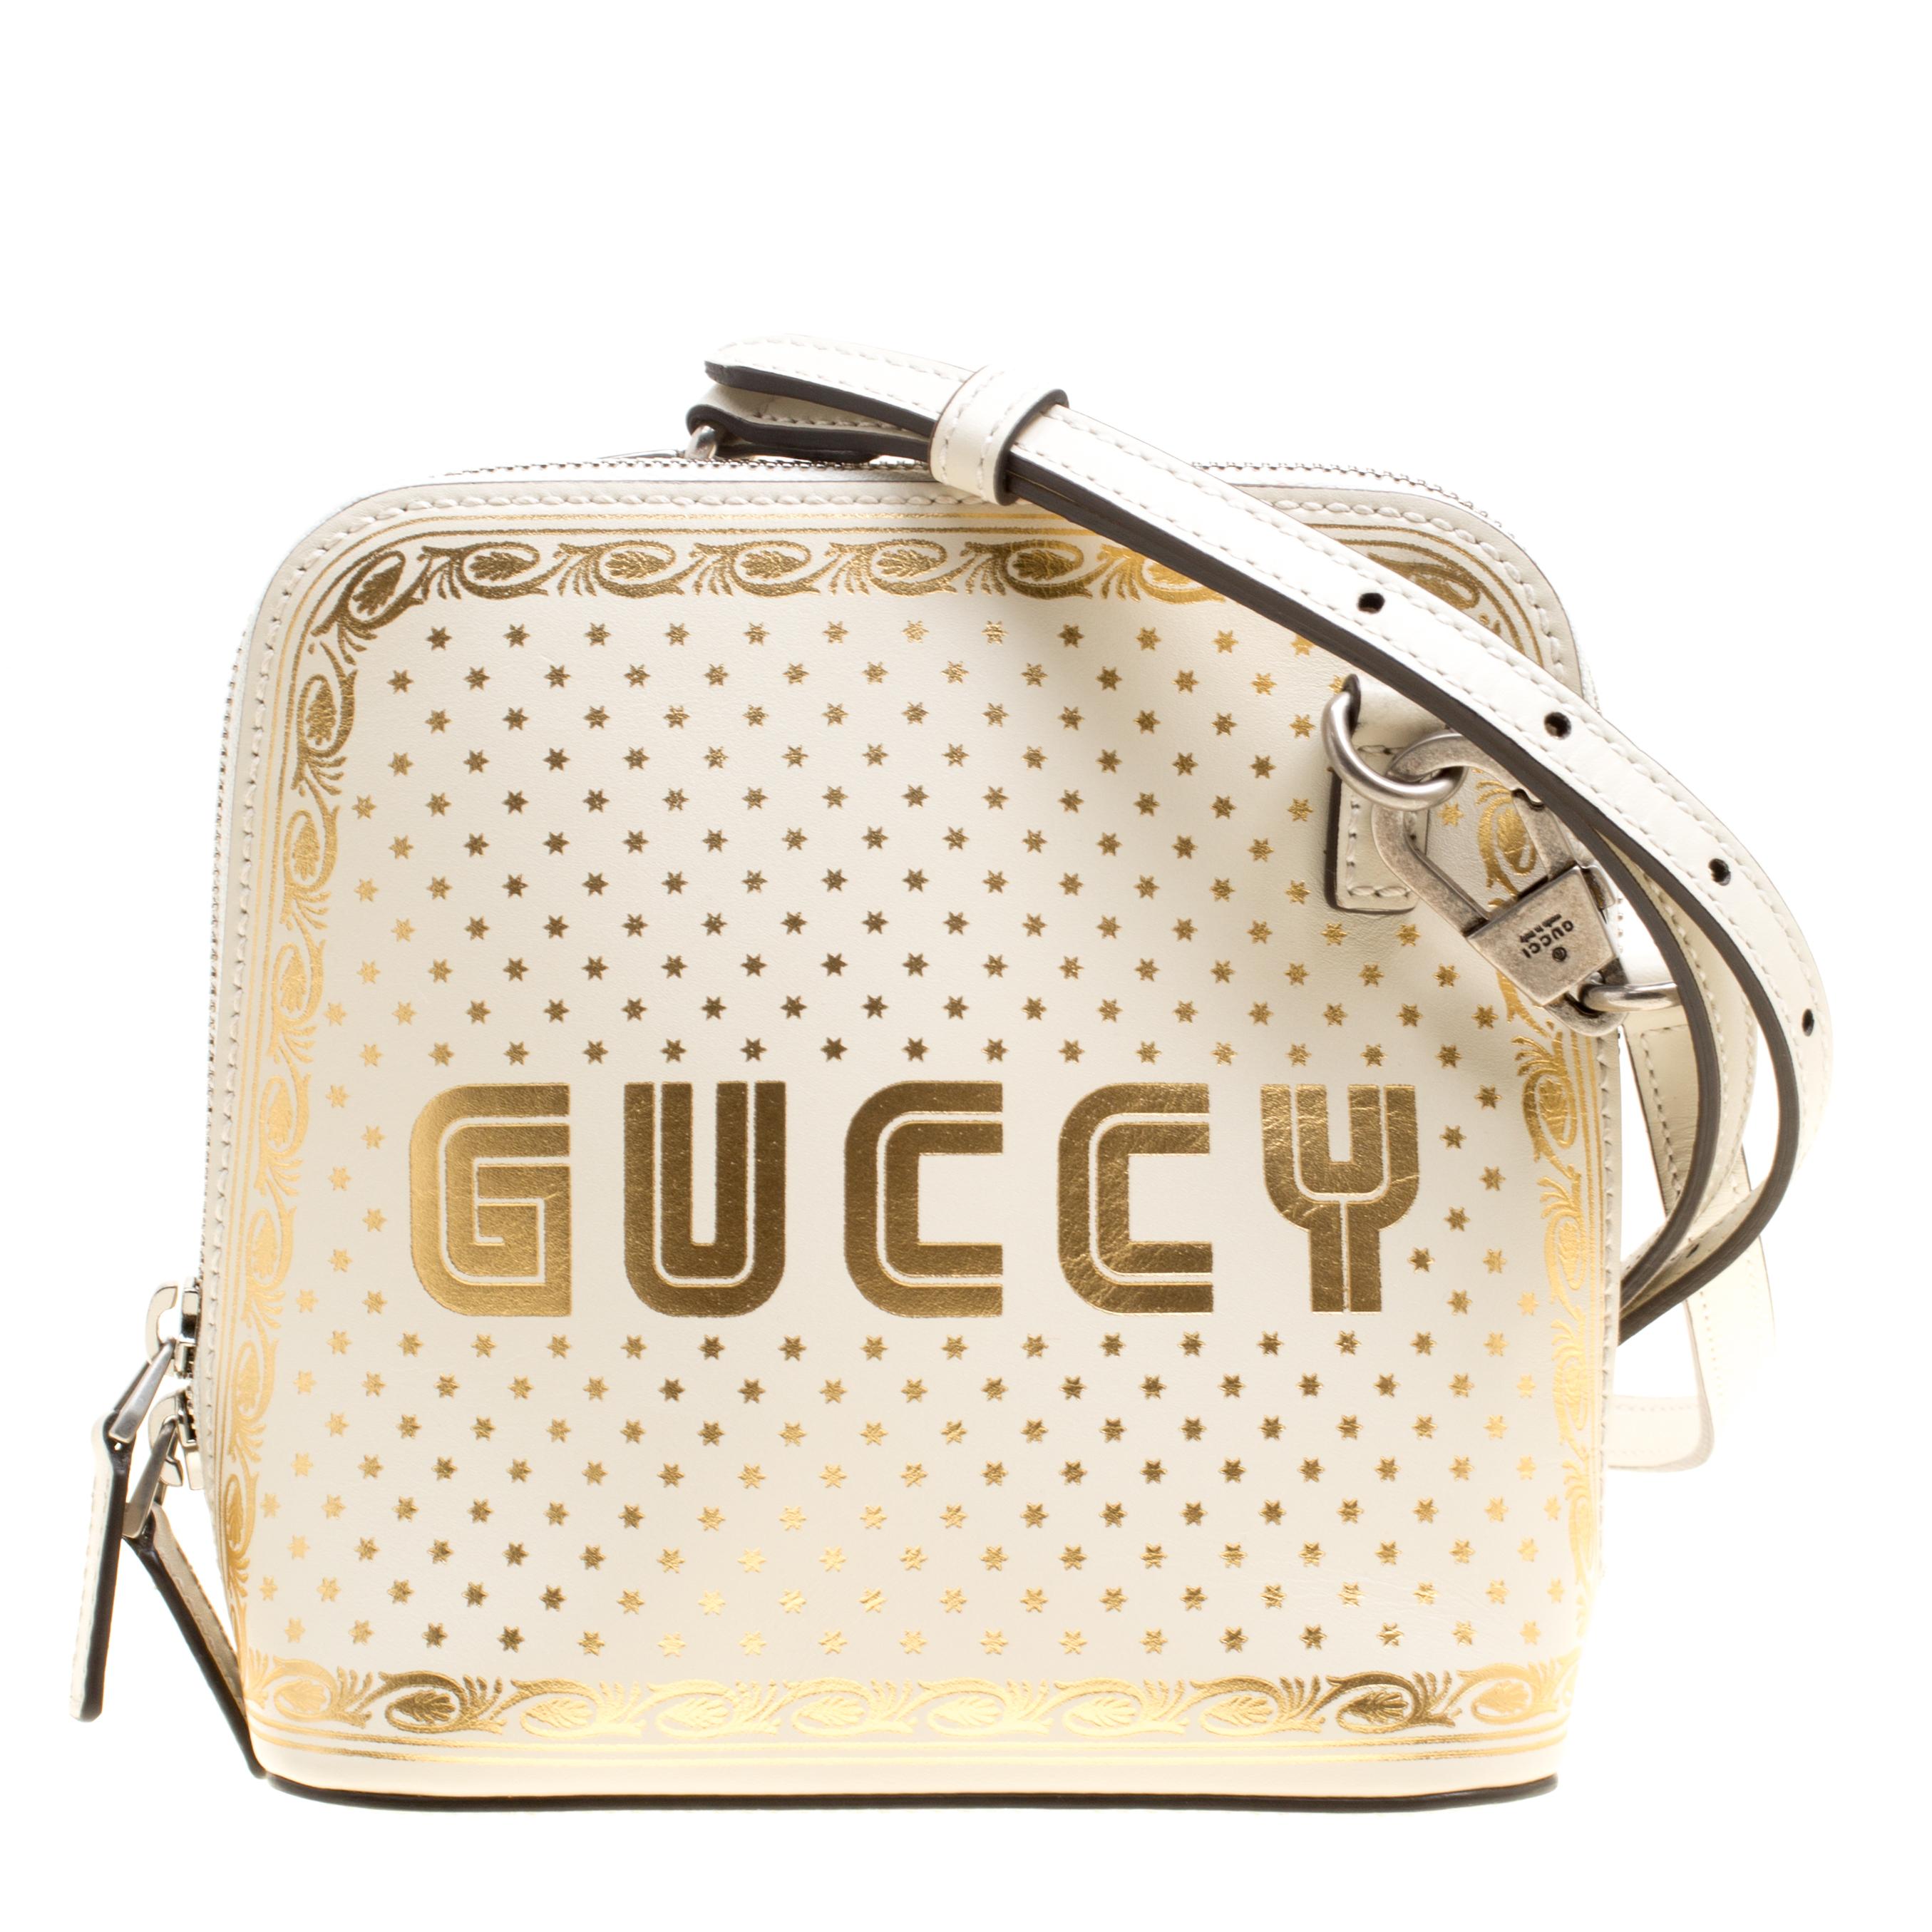 c668975e476 ... Gucci White Gold Leather Mini Guccy Shoulder Bag. nextprev. prevnext